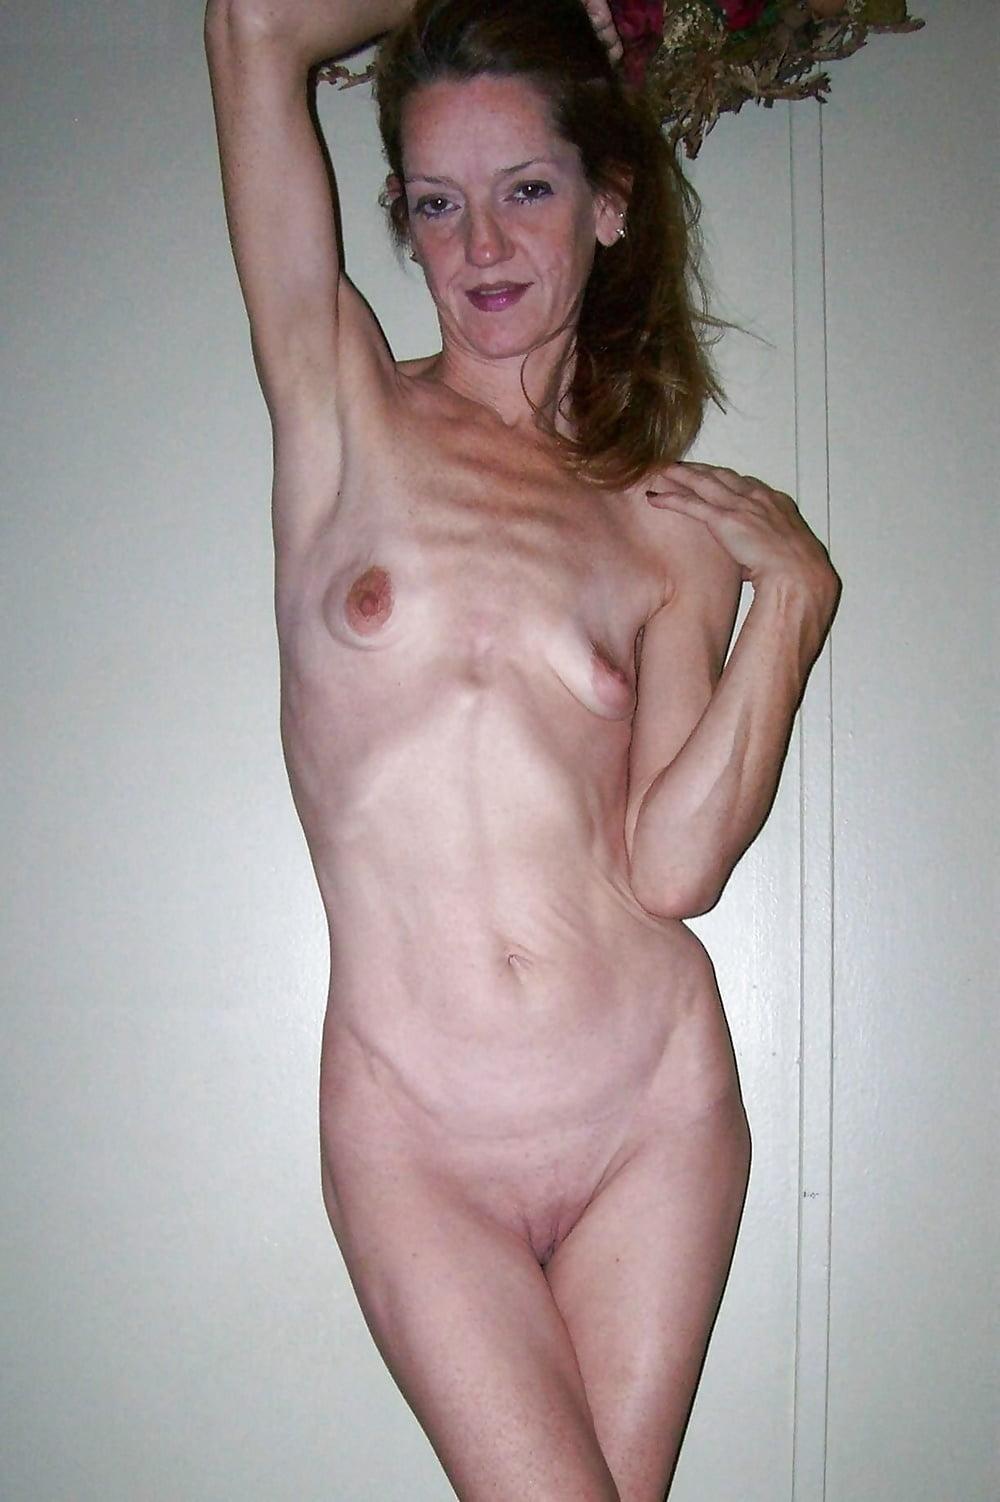 ugly-skinny-girls-nude